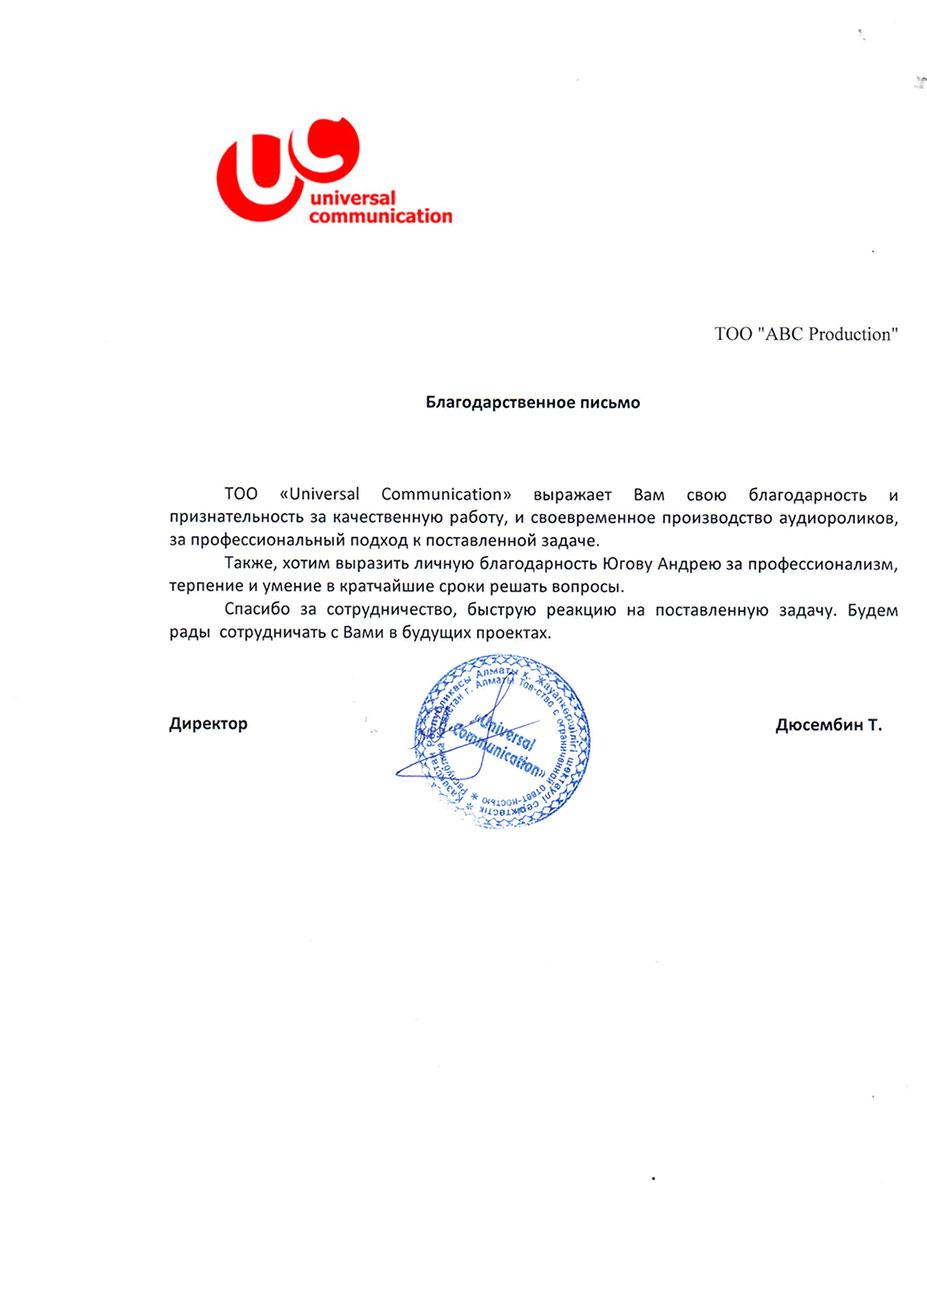 Дюсембин Тамерлан